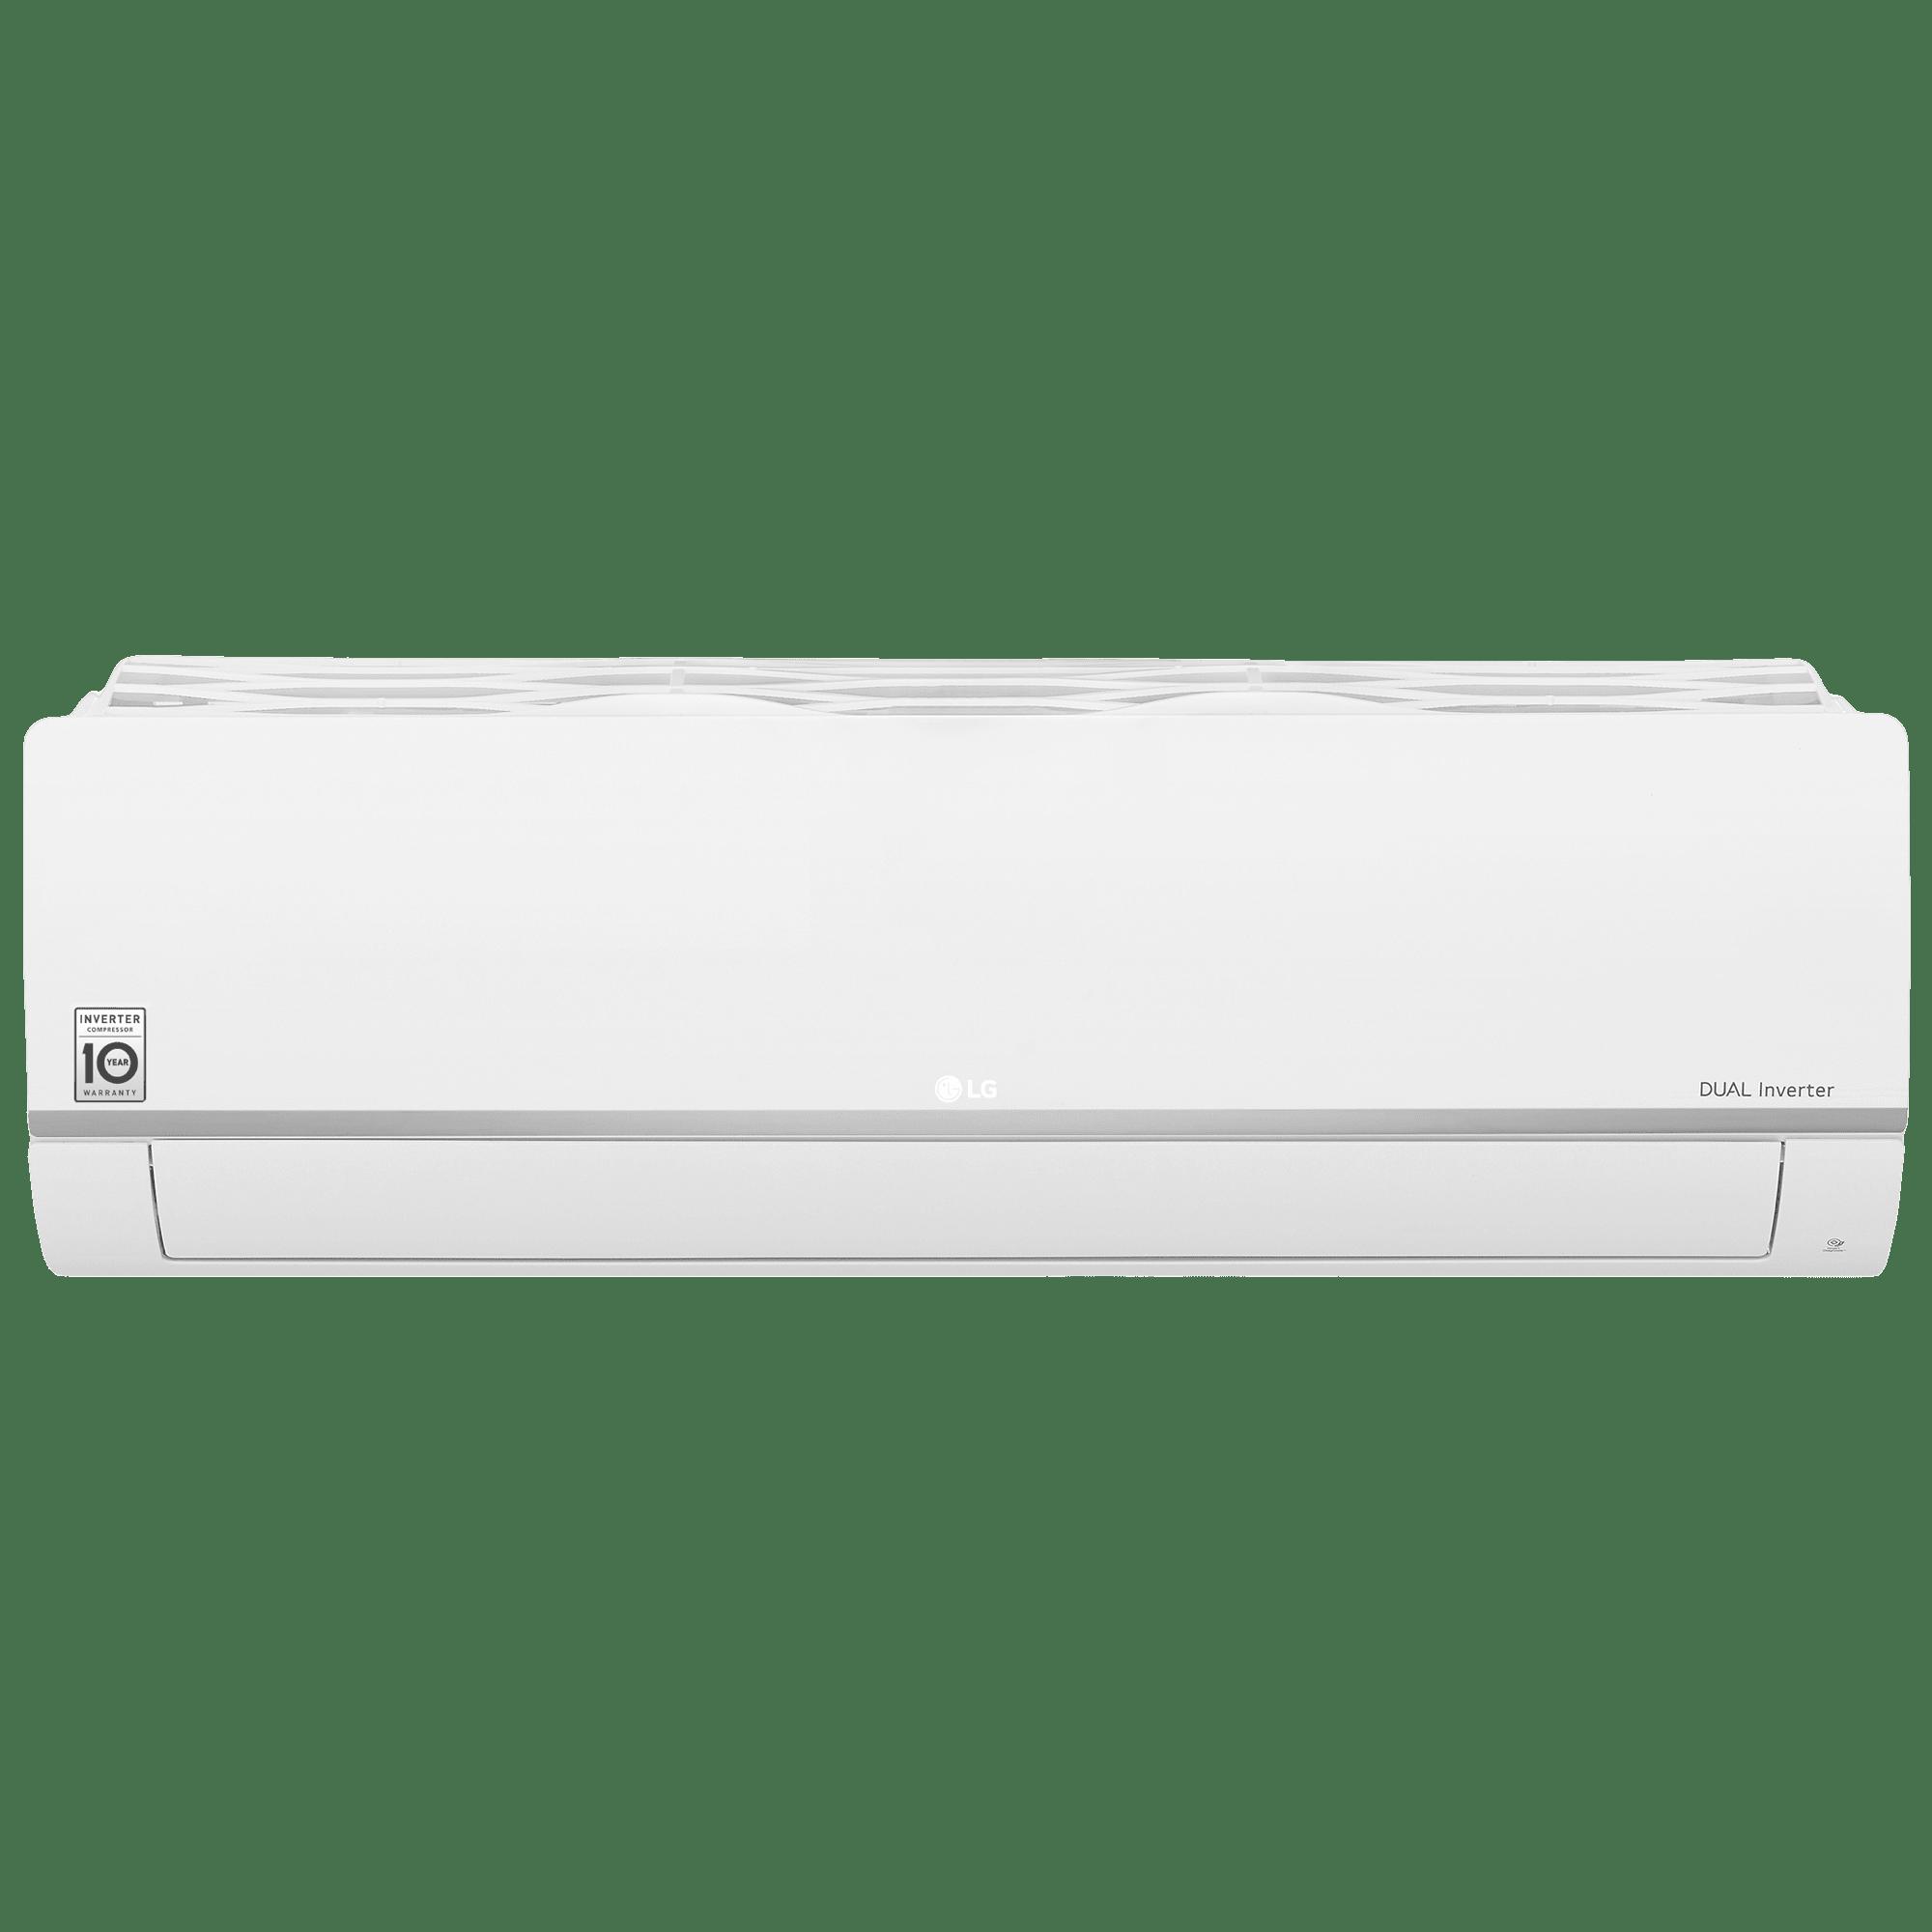 LG 1 Ton 5 Star Inverter Split AC (Air Purification Function, Wi-Fi, Copper Condenser, MS-Q12SWZD, White)